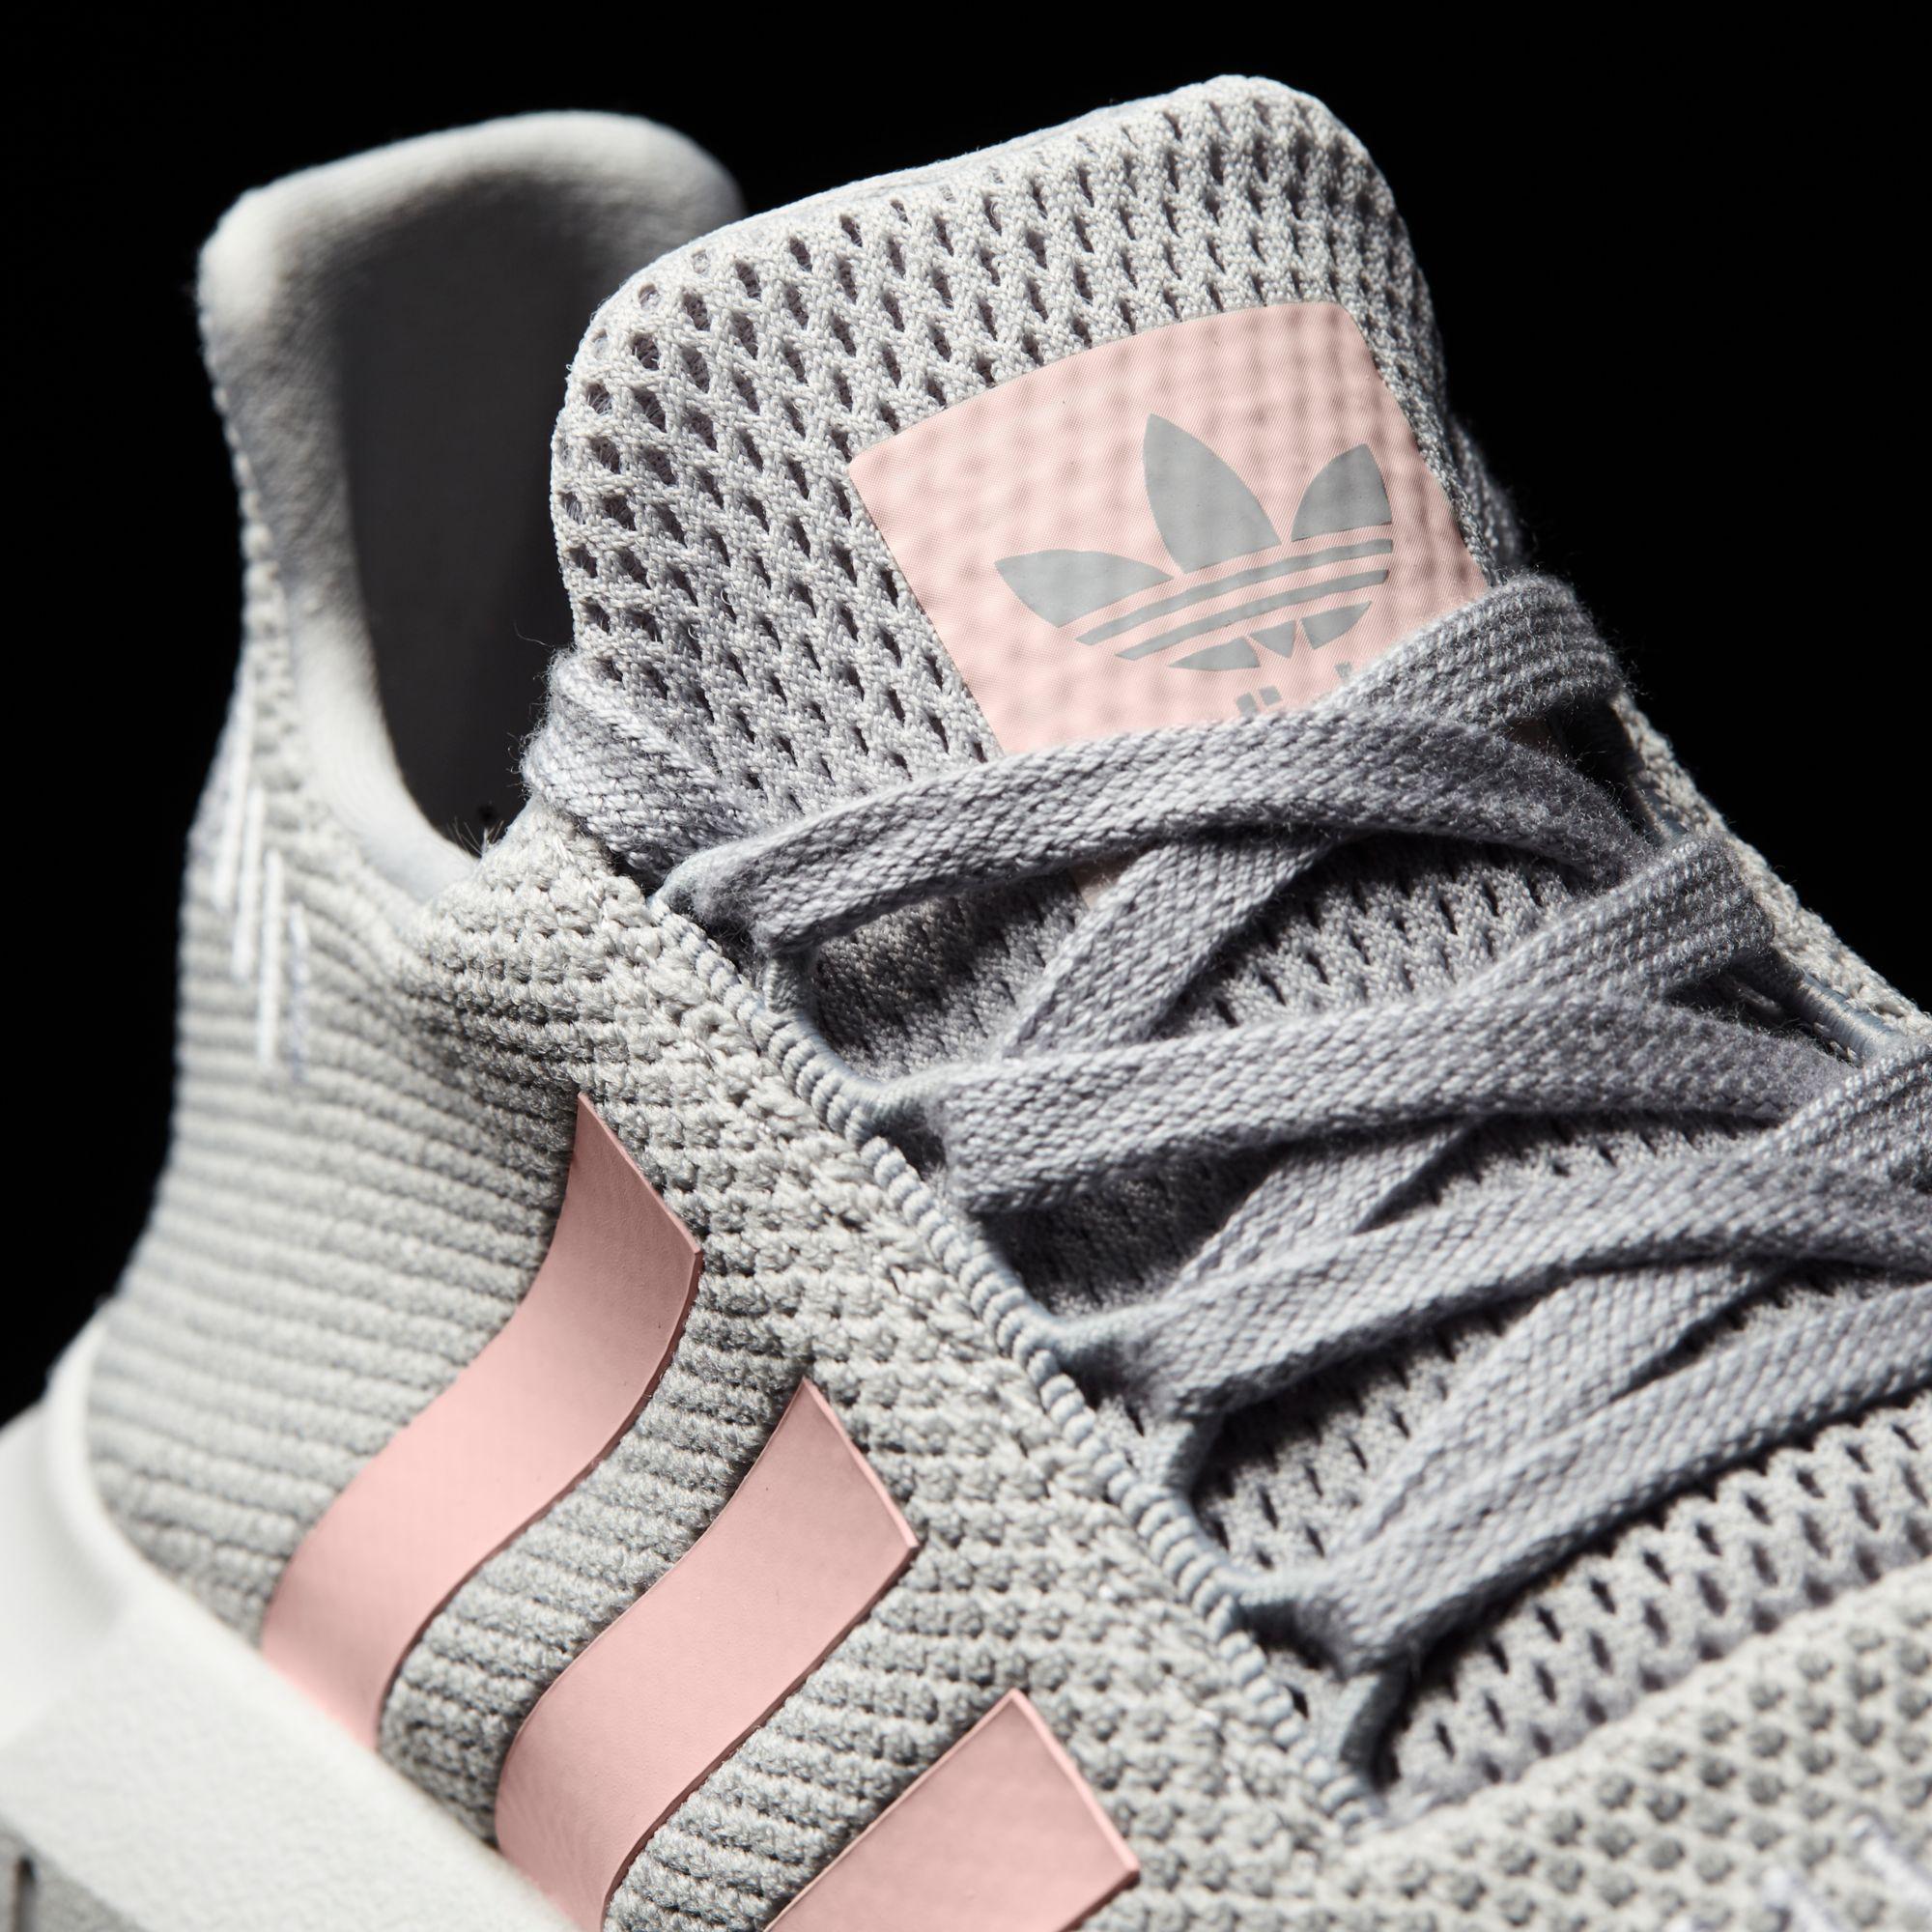 06877c822e813 Lyst - adidas Originals Swift Run Running Shoes in Gray